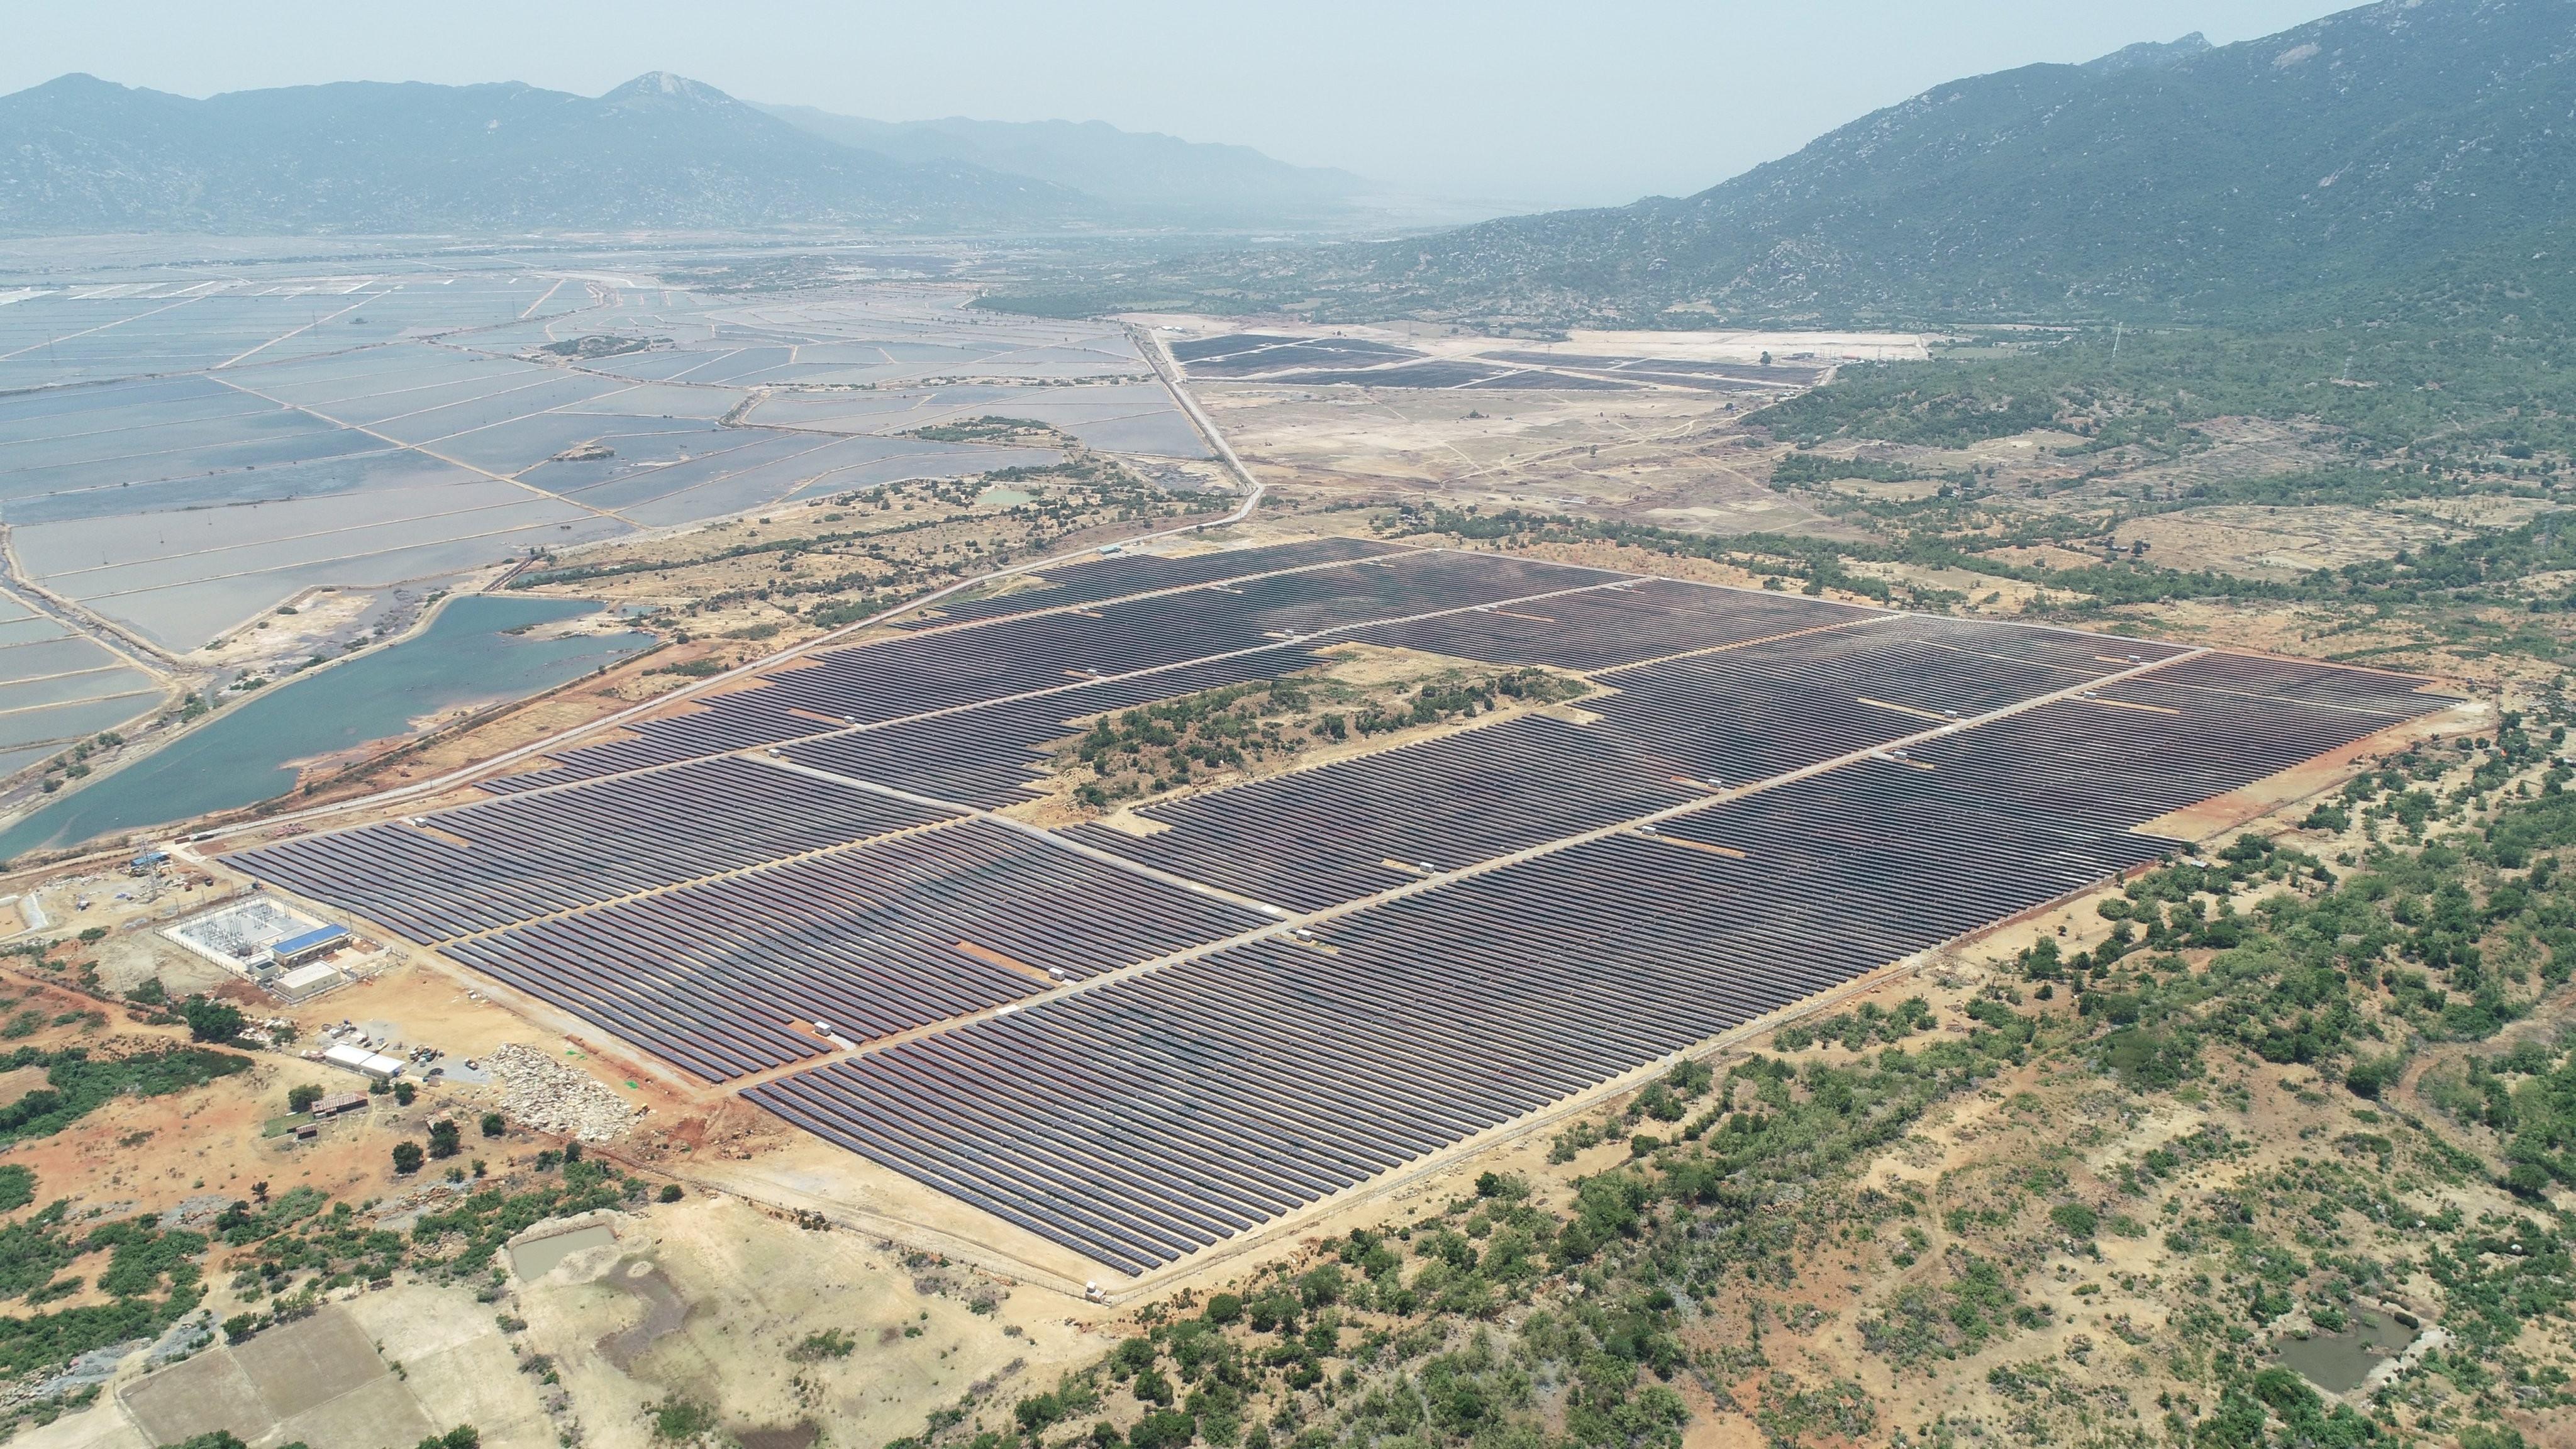 Thuan Nam 19 Solar Power Project